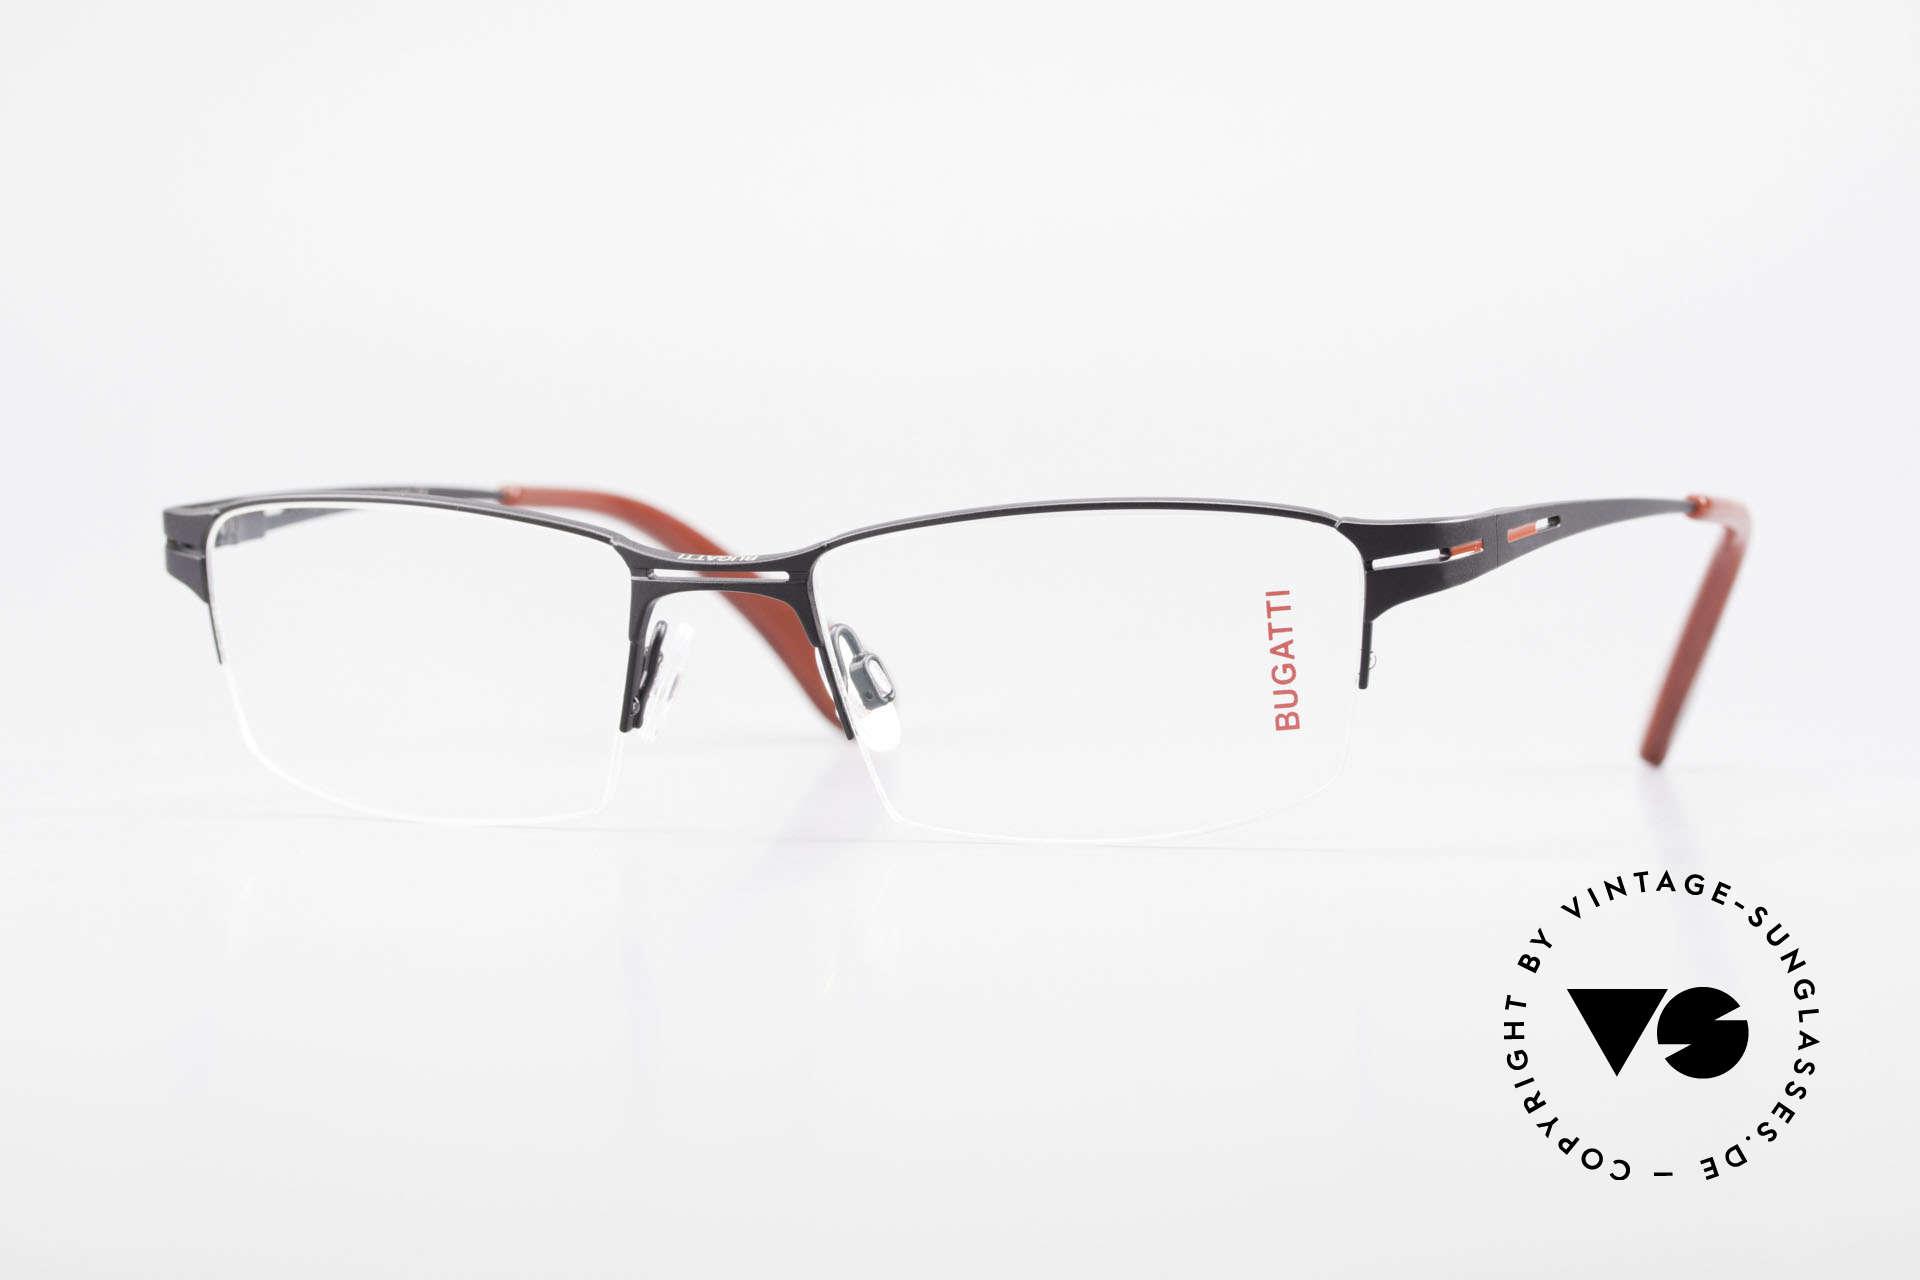 Bugatti 456 Titanium Eyeglass-Frame Nylor, original, vintage NYLOR eyeglass-frame by Bugatti, Made for Men